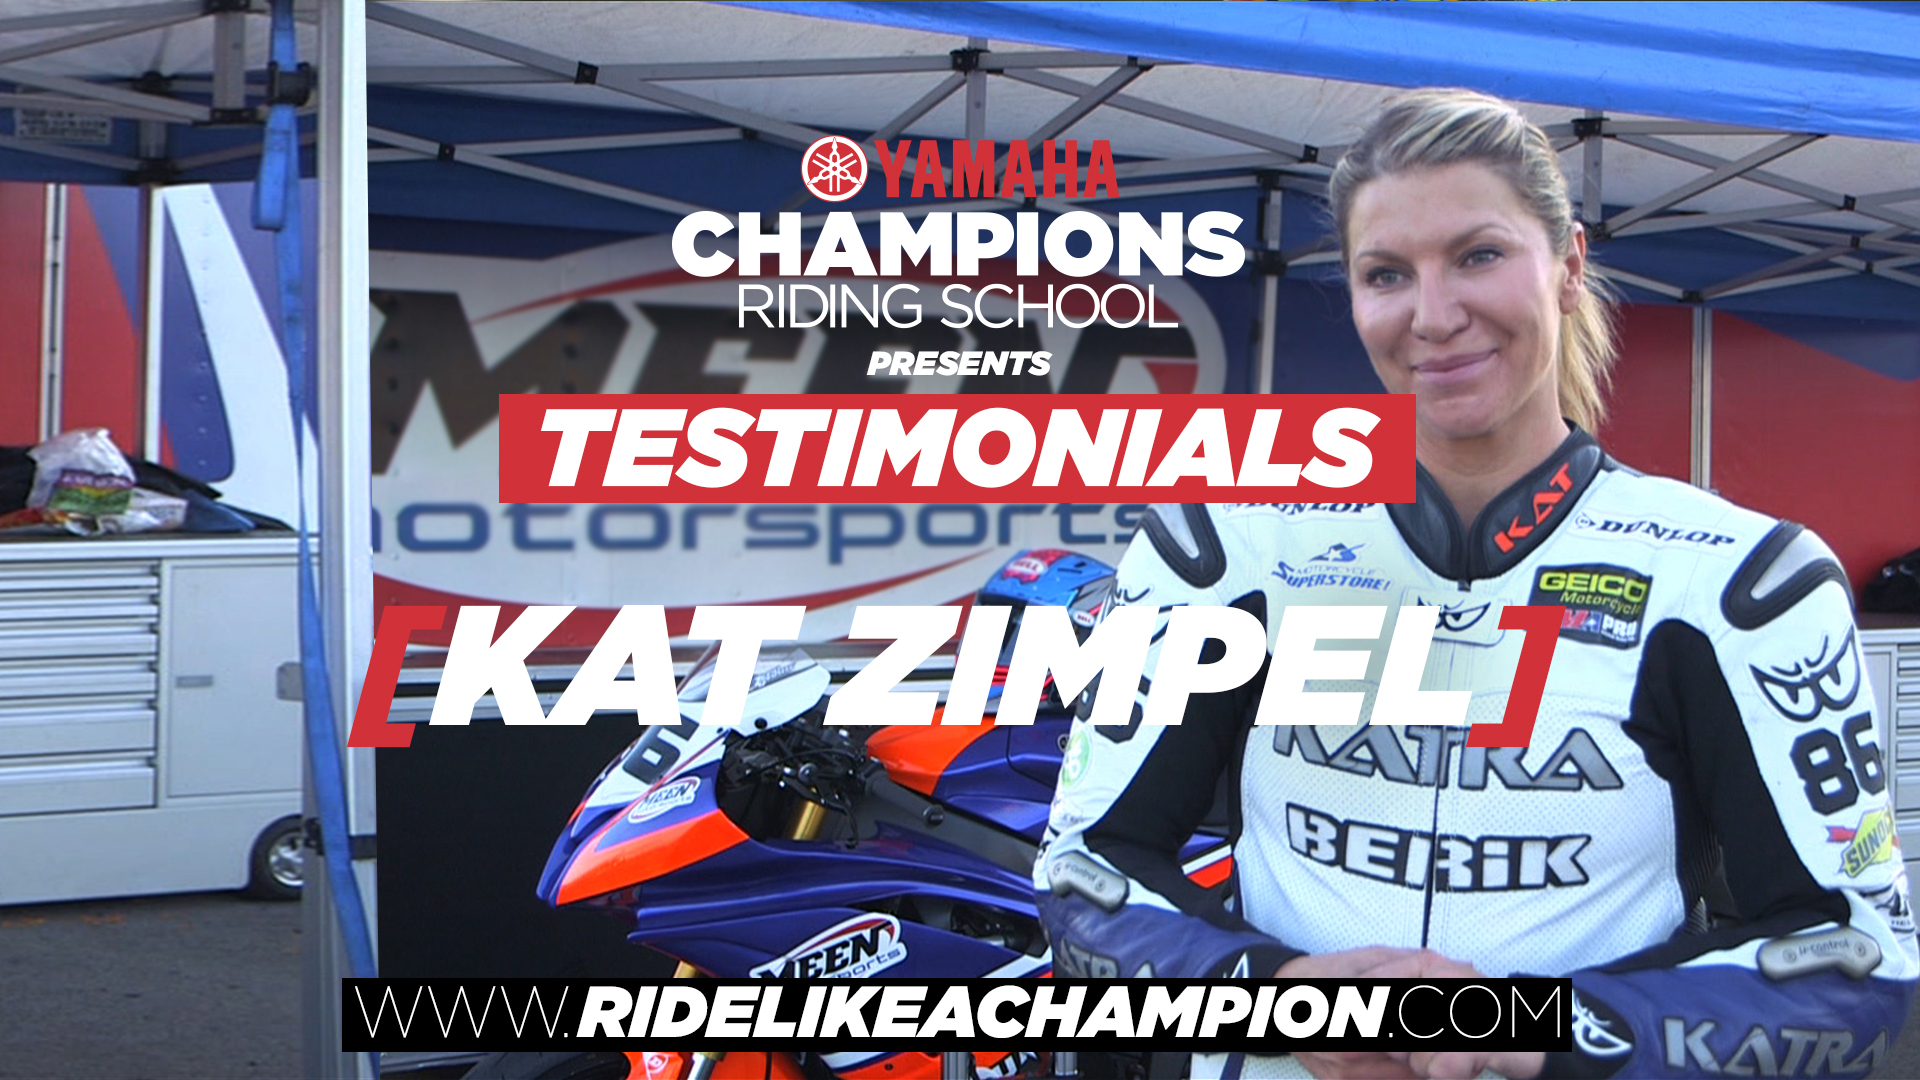 Kat Zimpel - Yamaha Champions Riding School Testimonial